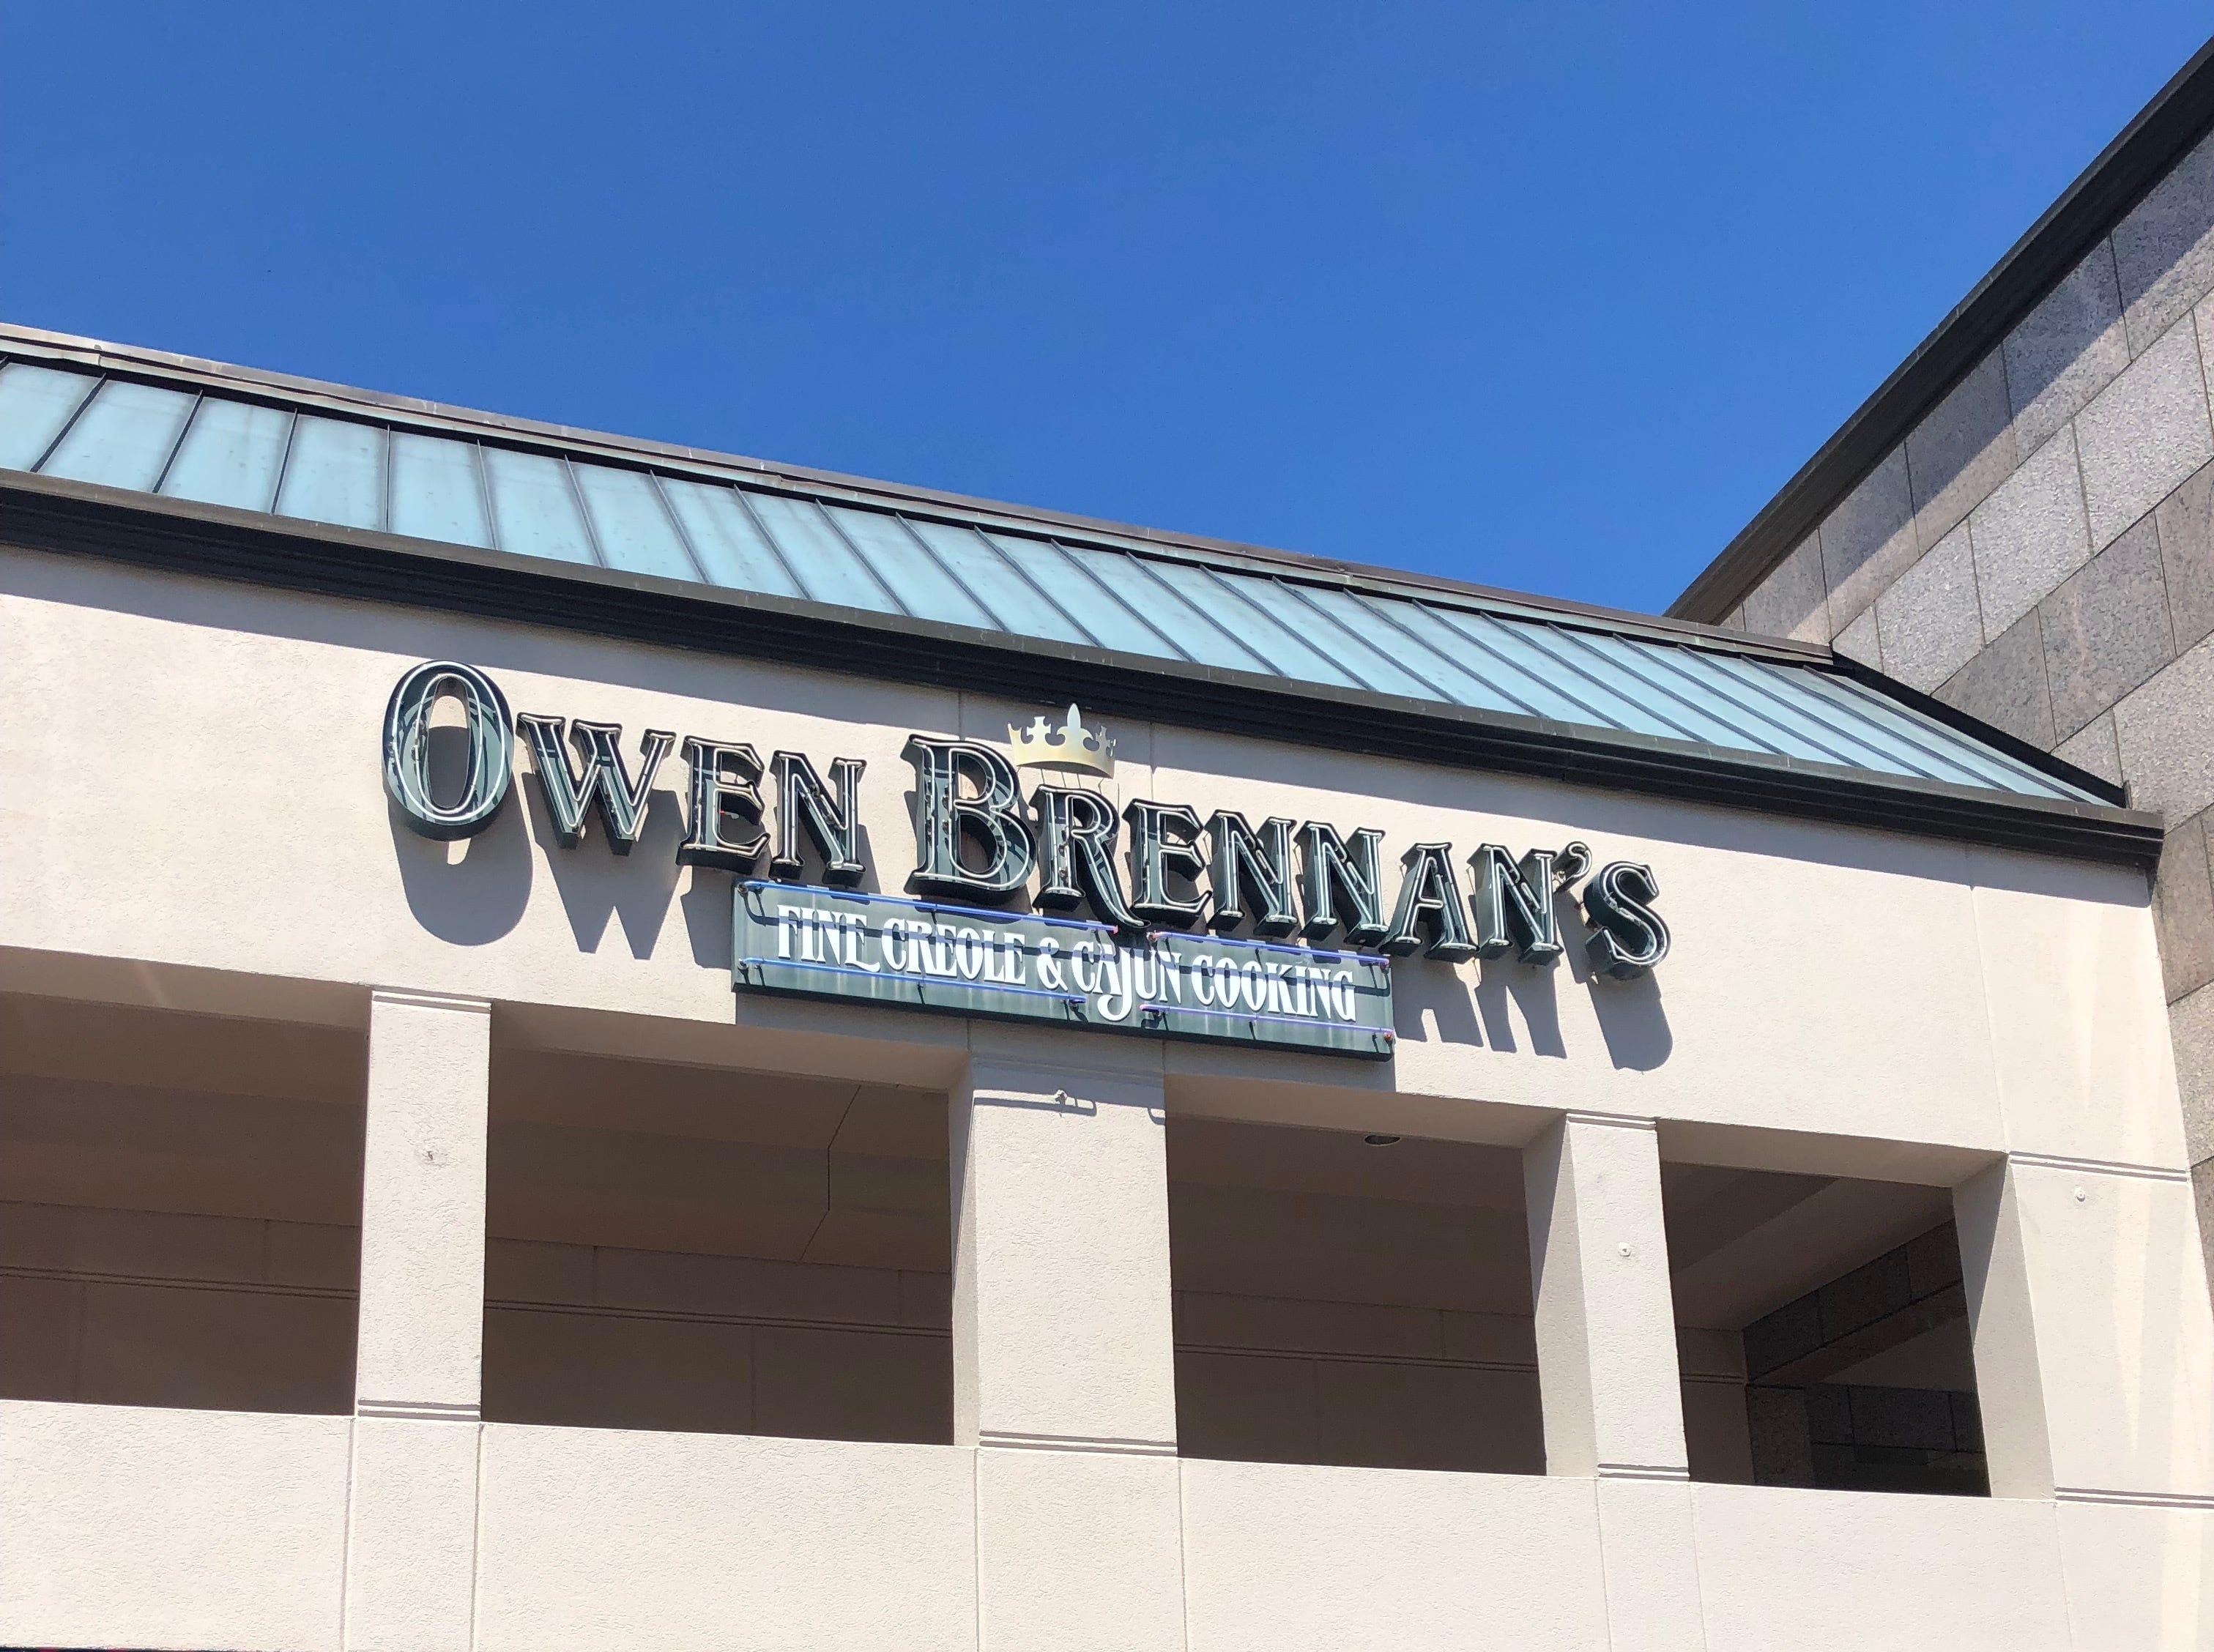 Owen Brennan's